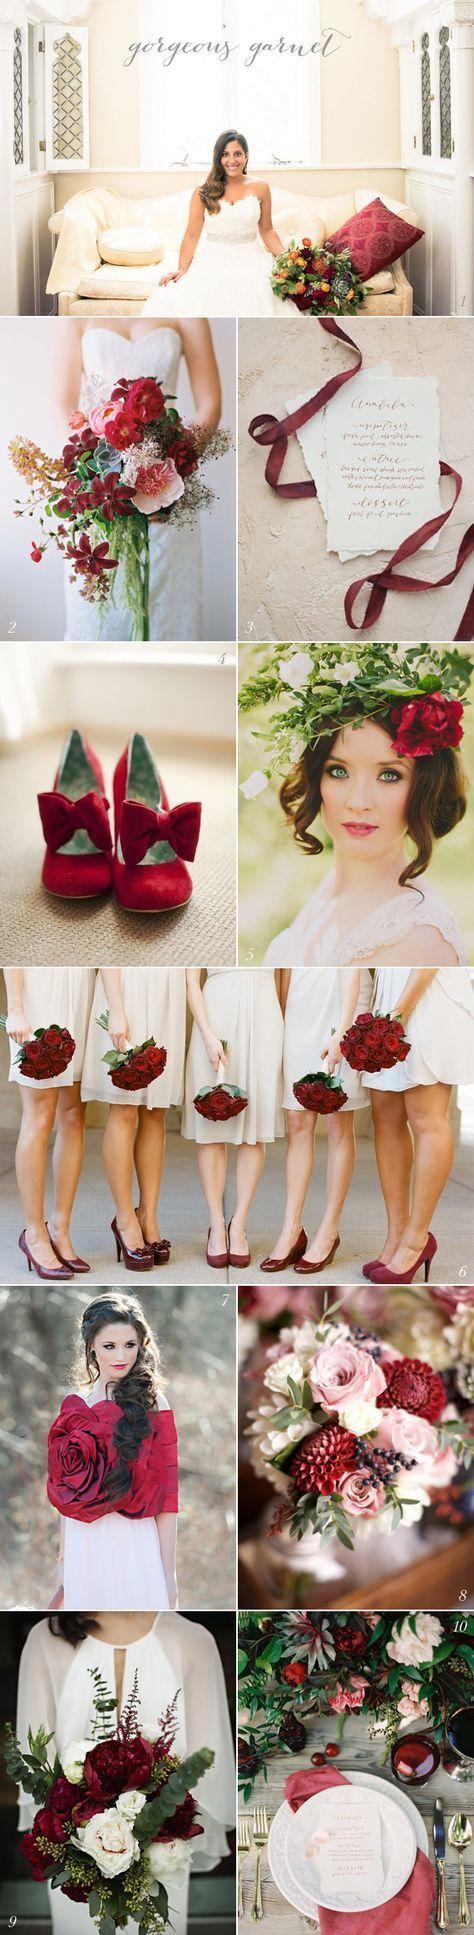 Свадебные Темы 2015 - Fashion Style Magazine - Страница 15